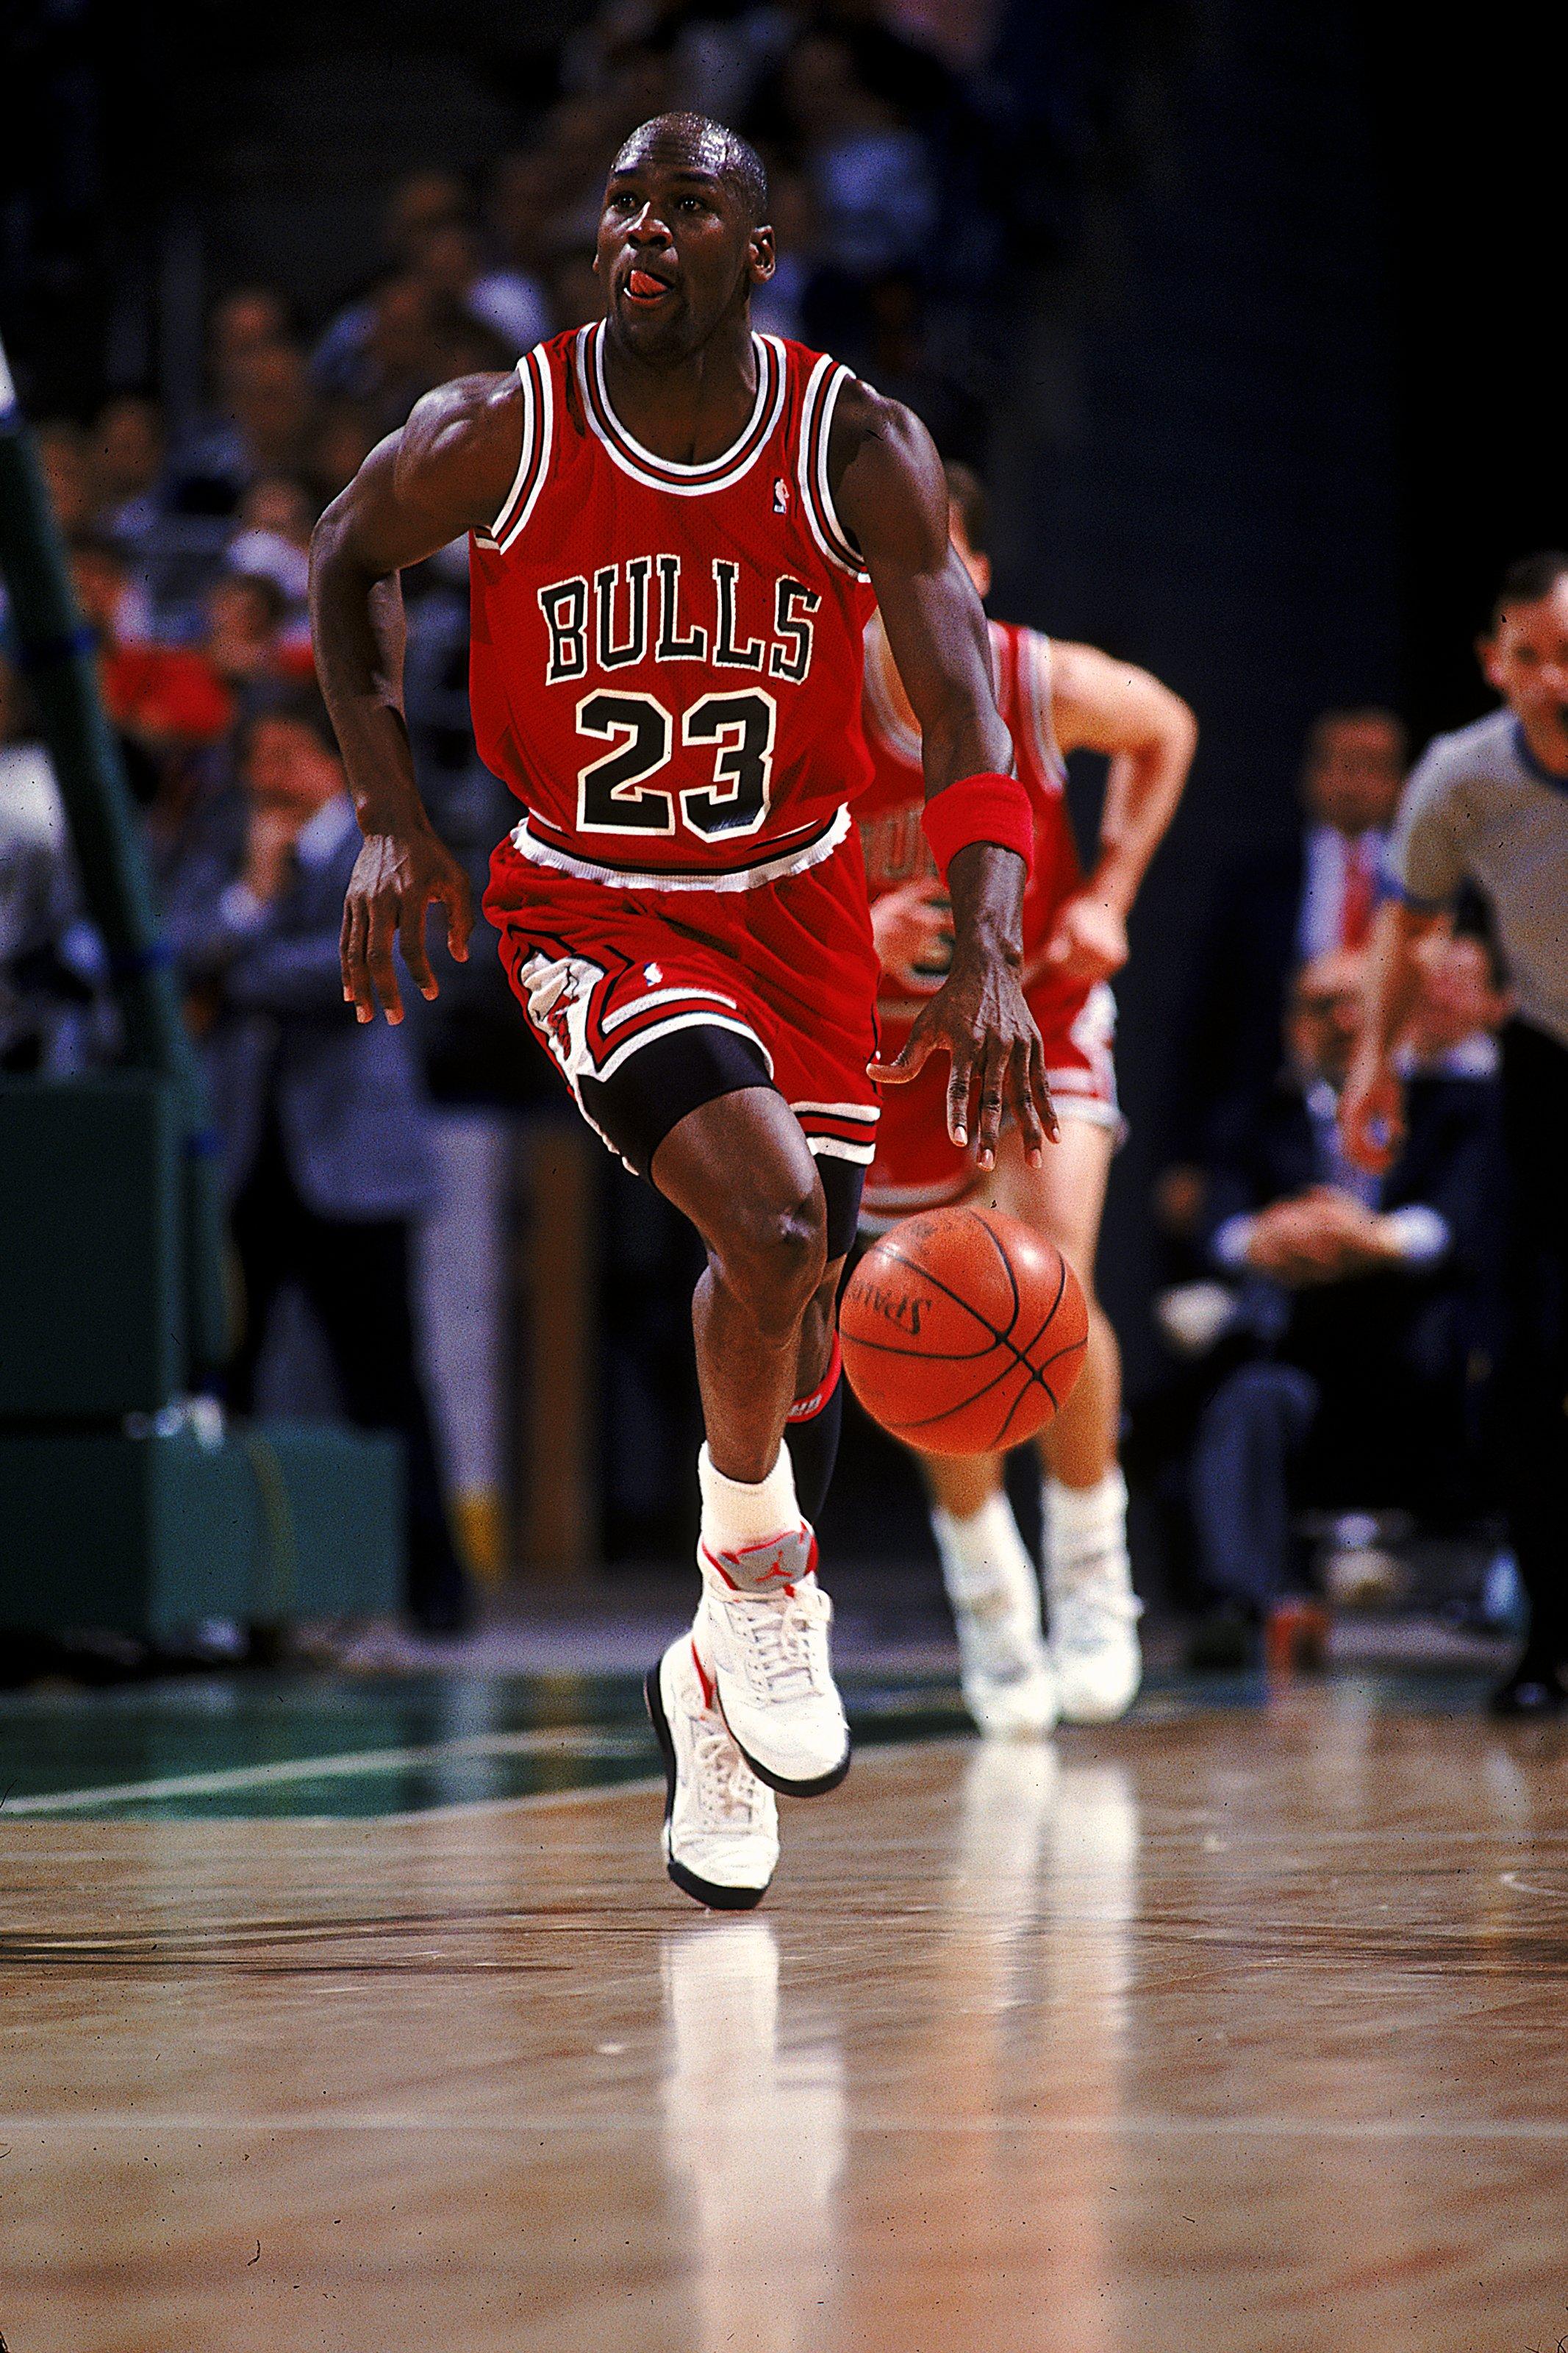 1990:  Michael Jordan #23 of the Chicago Bulls runs with the ball during the game.   Mandatory Credit: Allsport  /Allsport